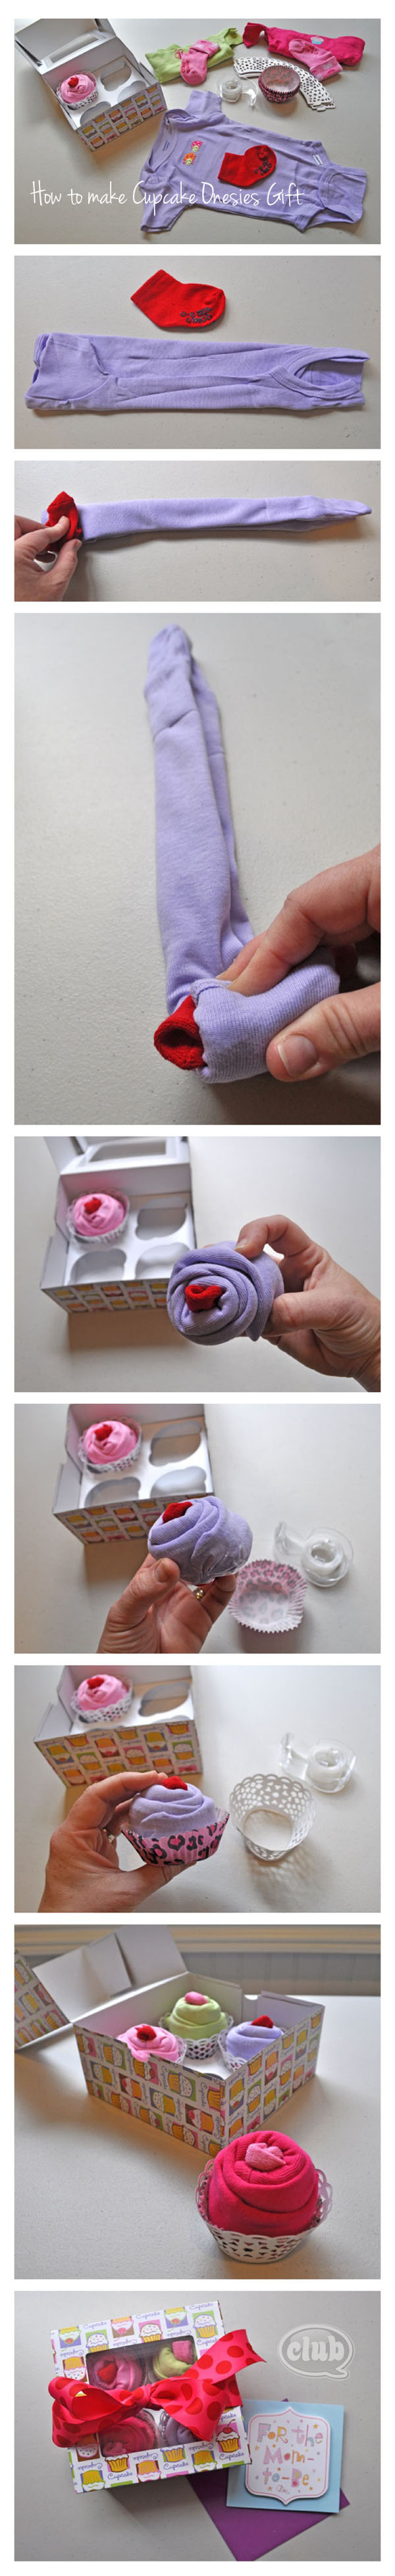 Cupcake onesies gift idea fold solutioingenieria Images